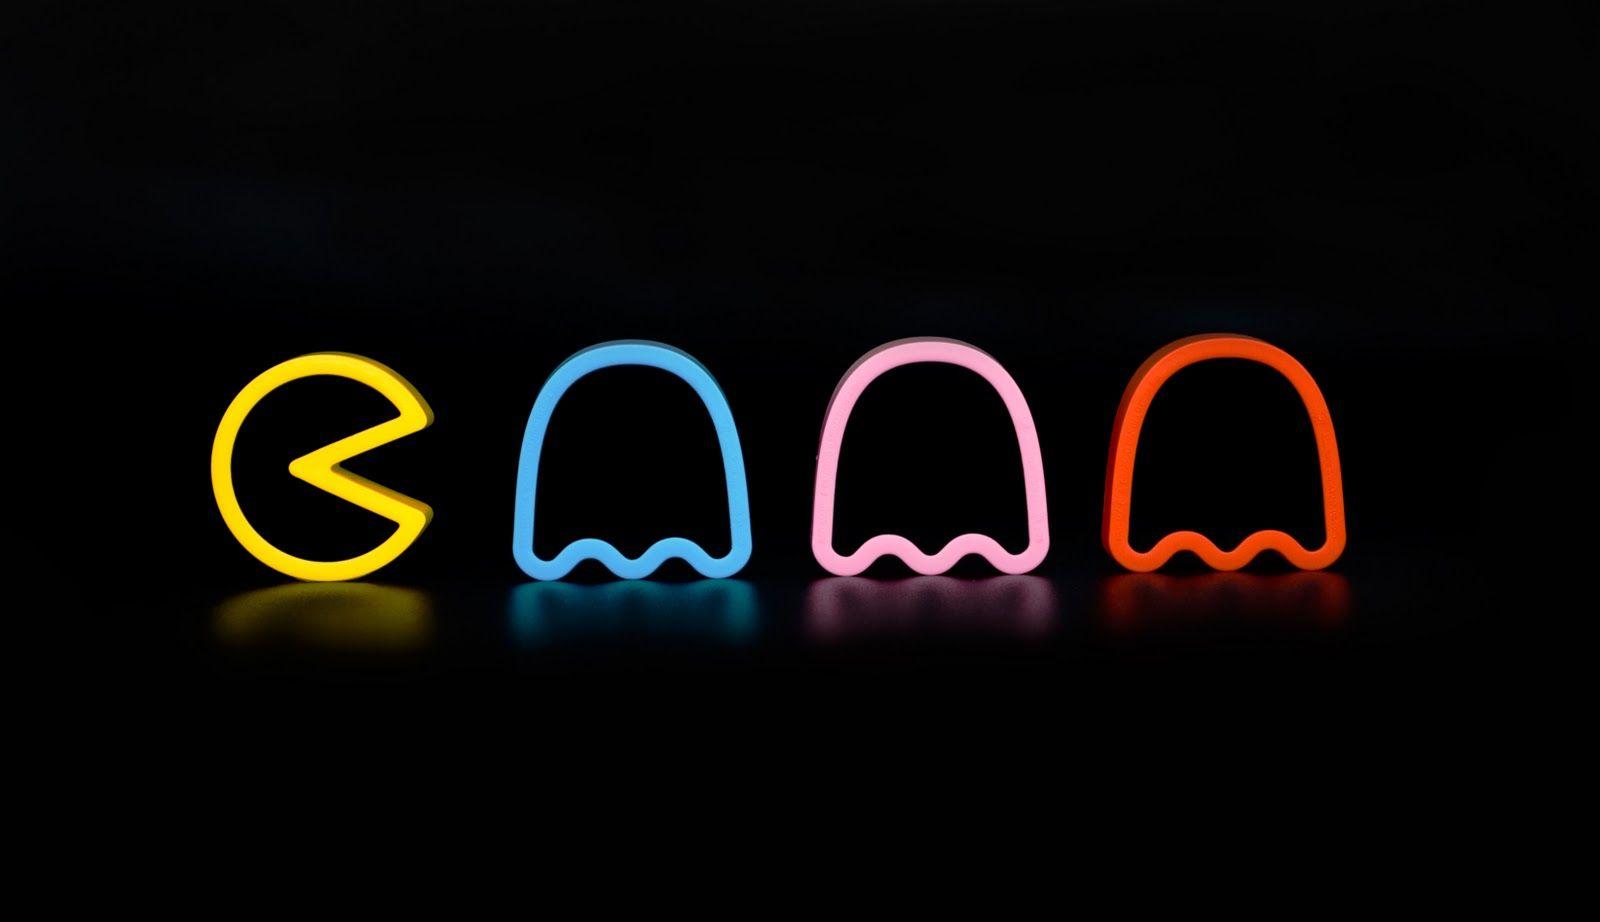 Neon Pacman Fondos De Pacman Fondo Para Laptop Pantalla De Laptop